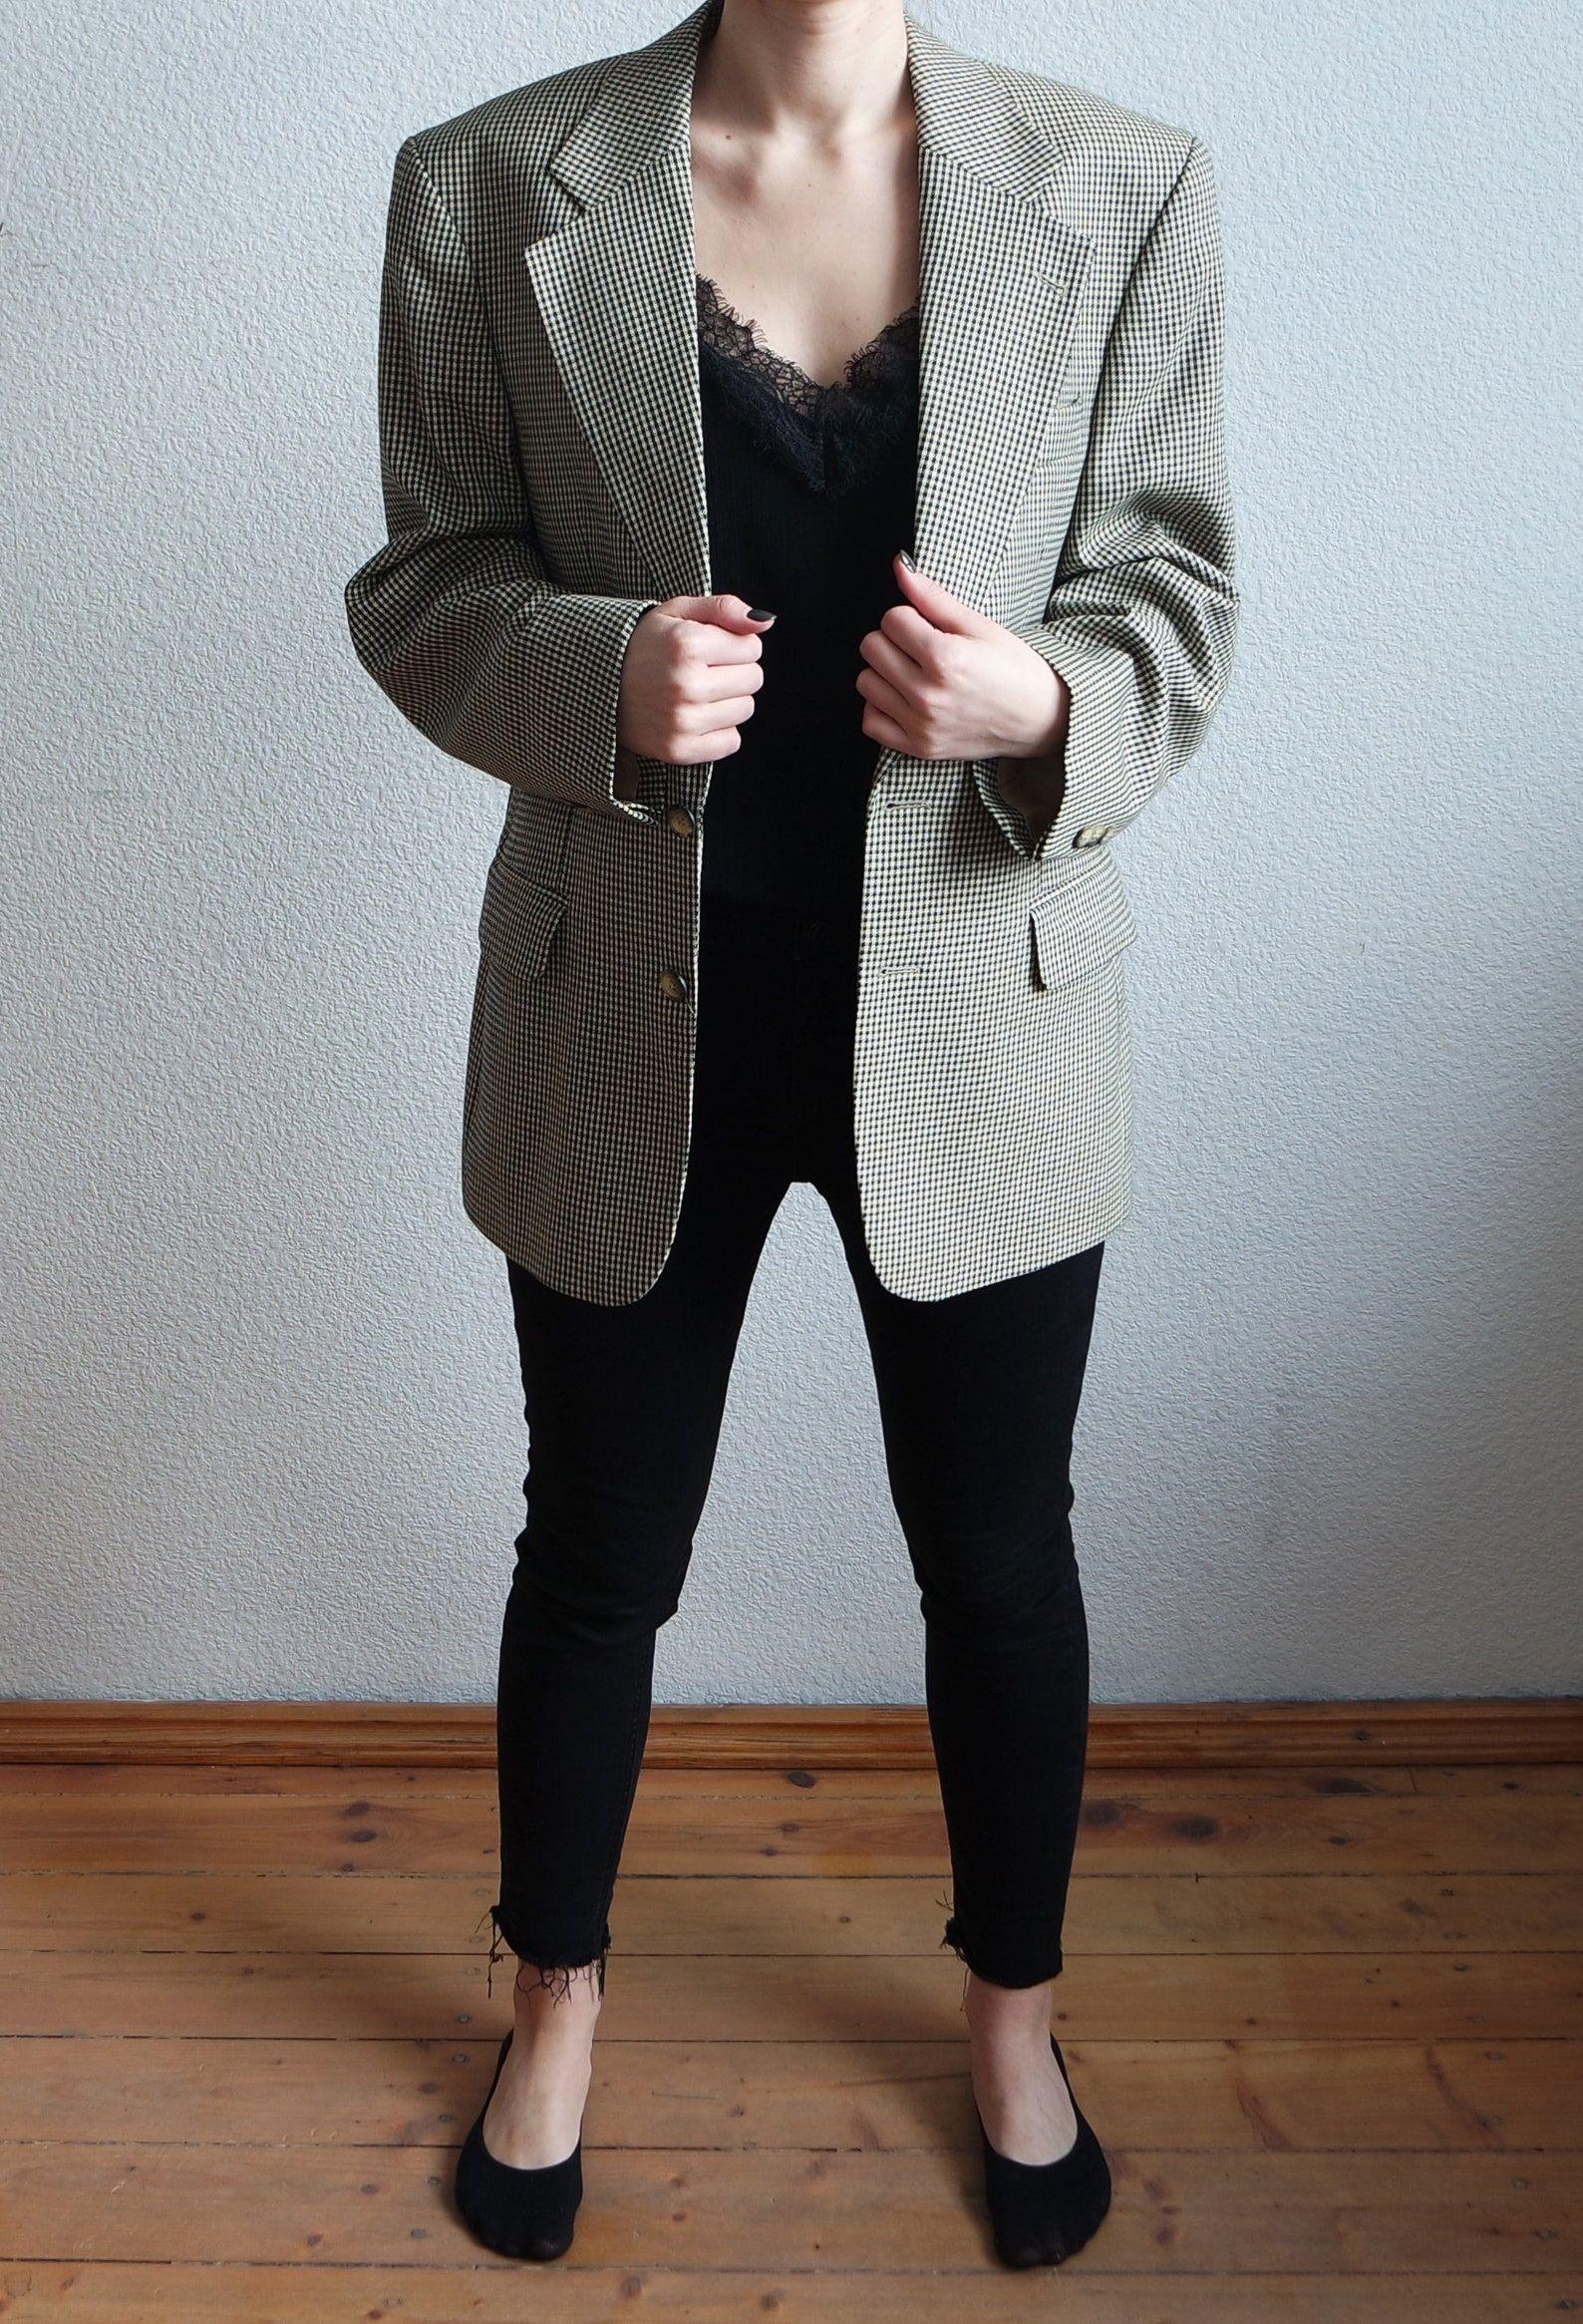 Vintage Velvet Jacket Beige Floral Womens Jacket Vintage Beige Velvet Coat Jacket Corduroy Blazer With Buttons Classic Short Jacket